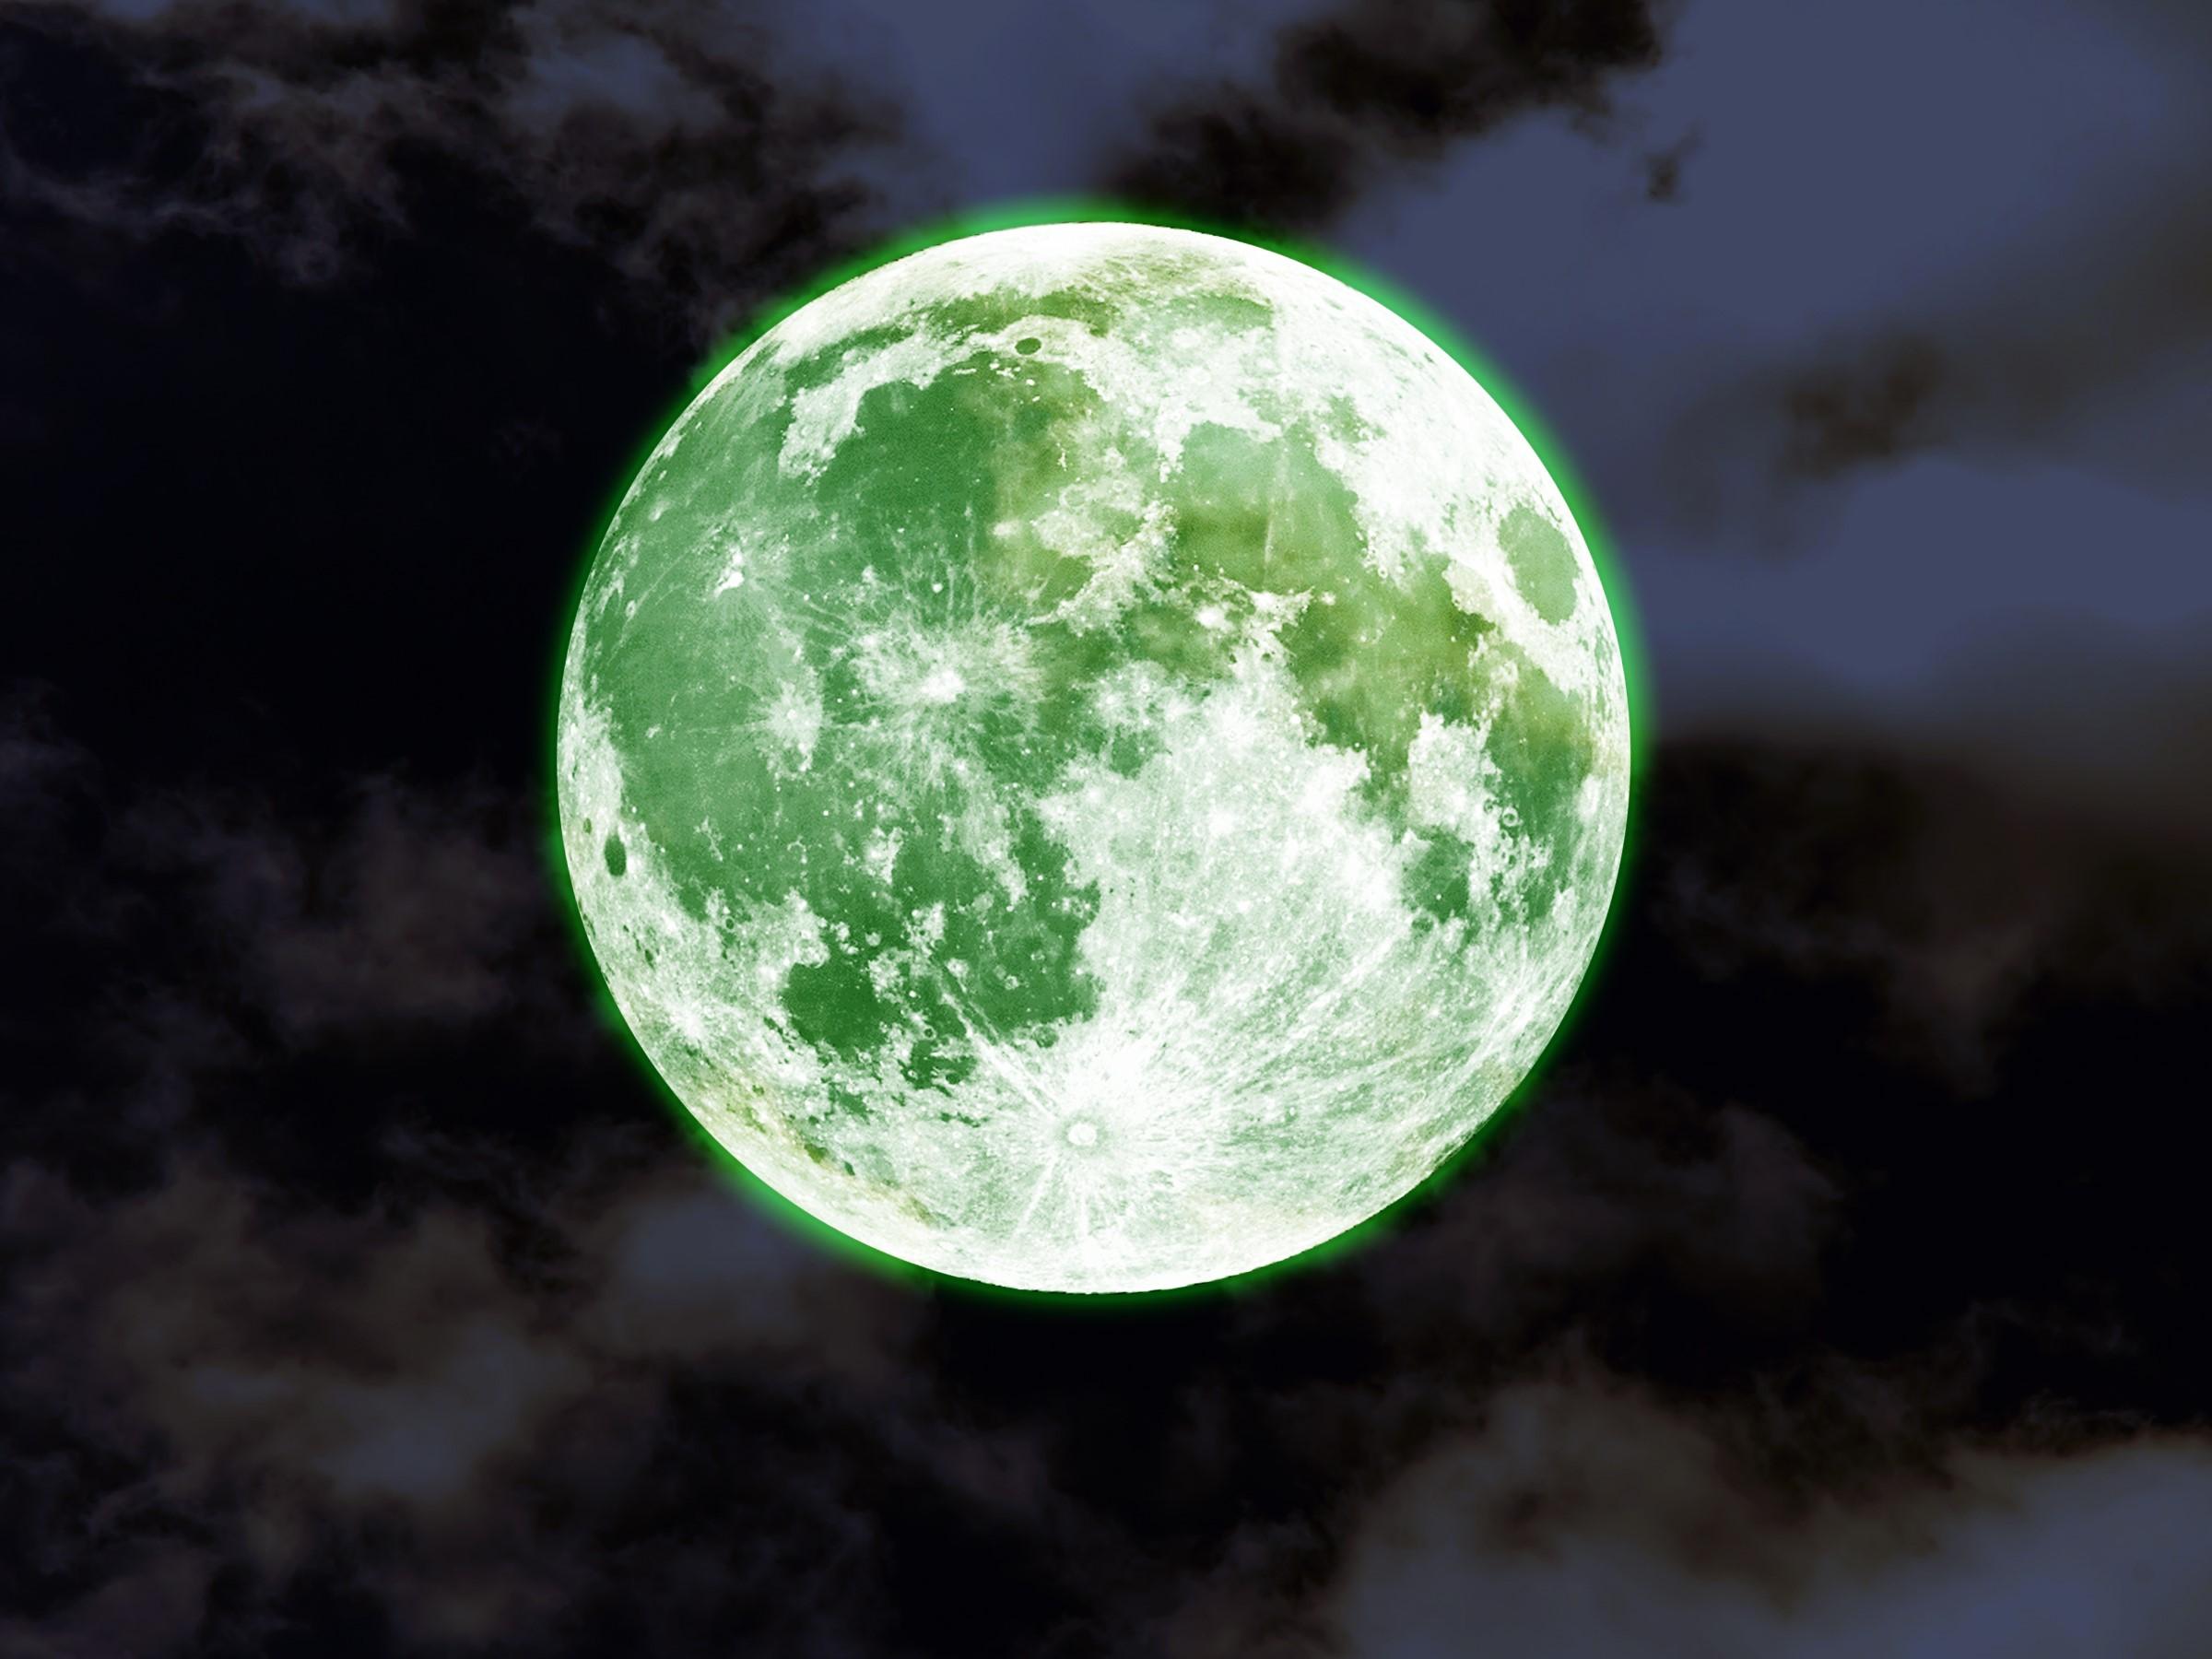 The moon will turn green.